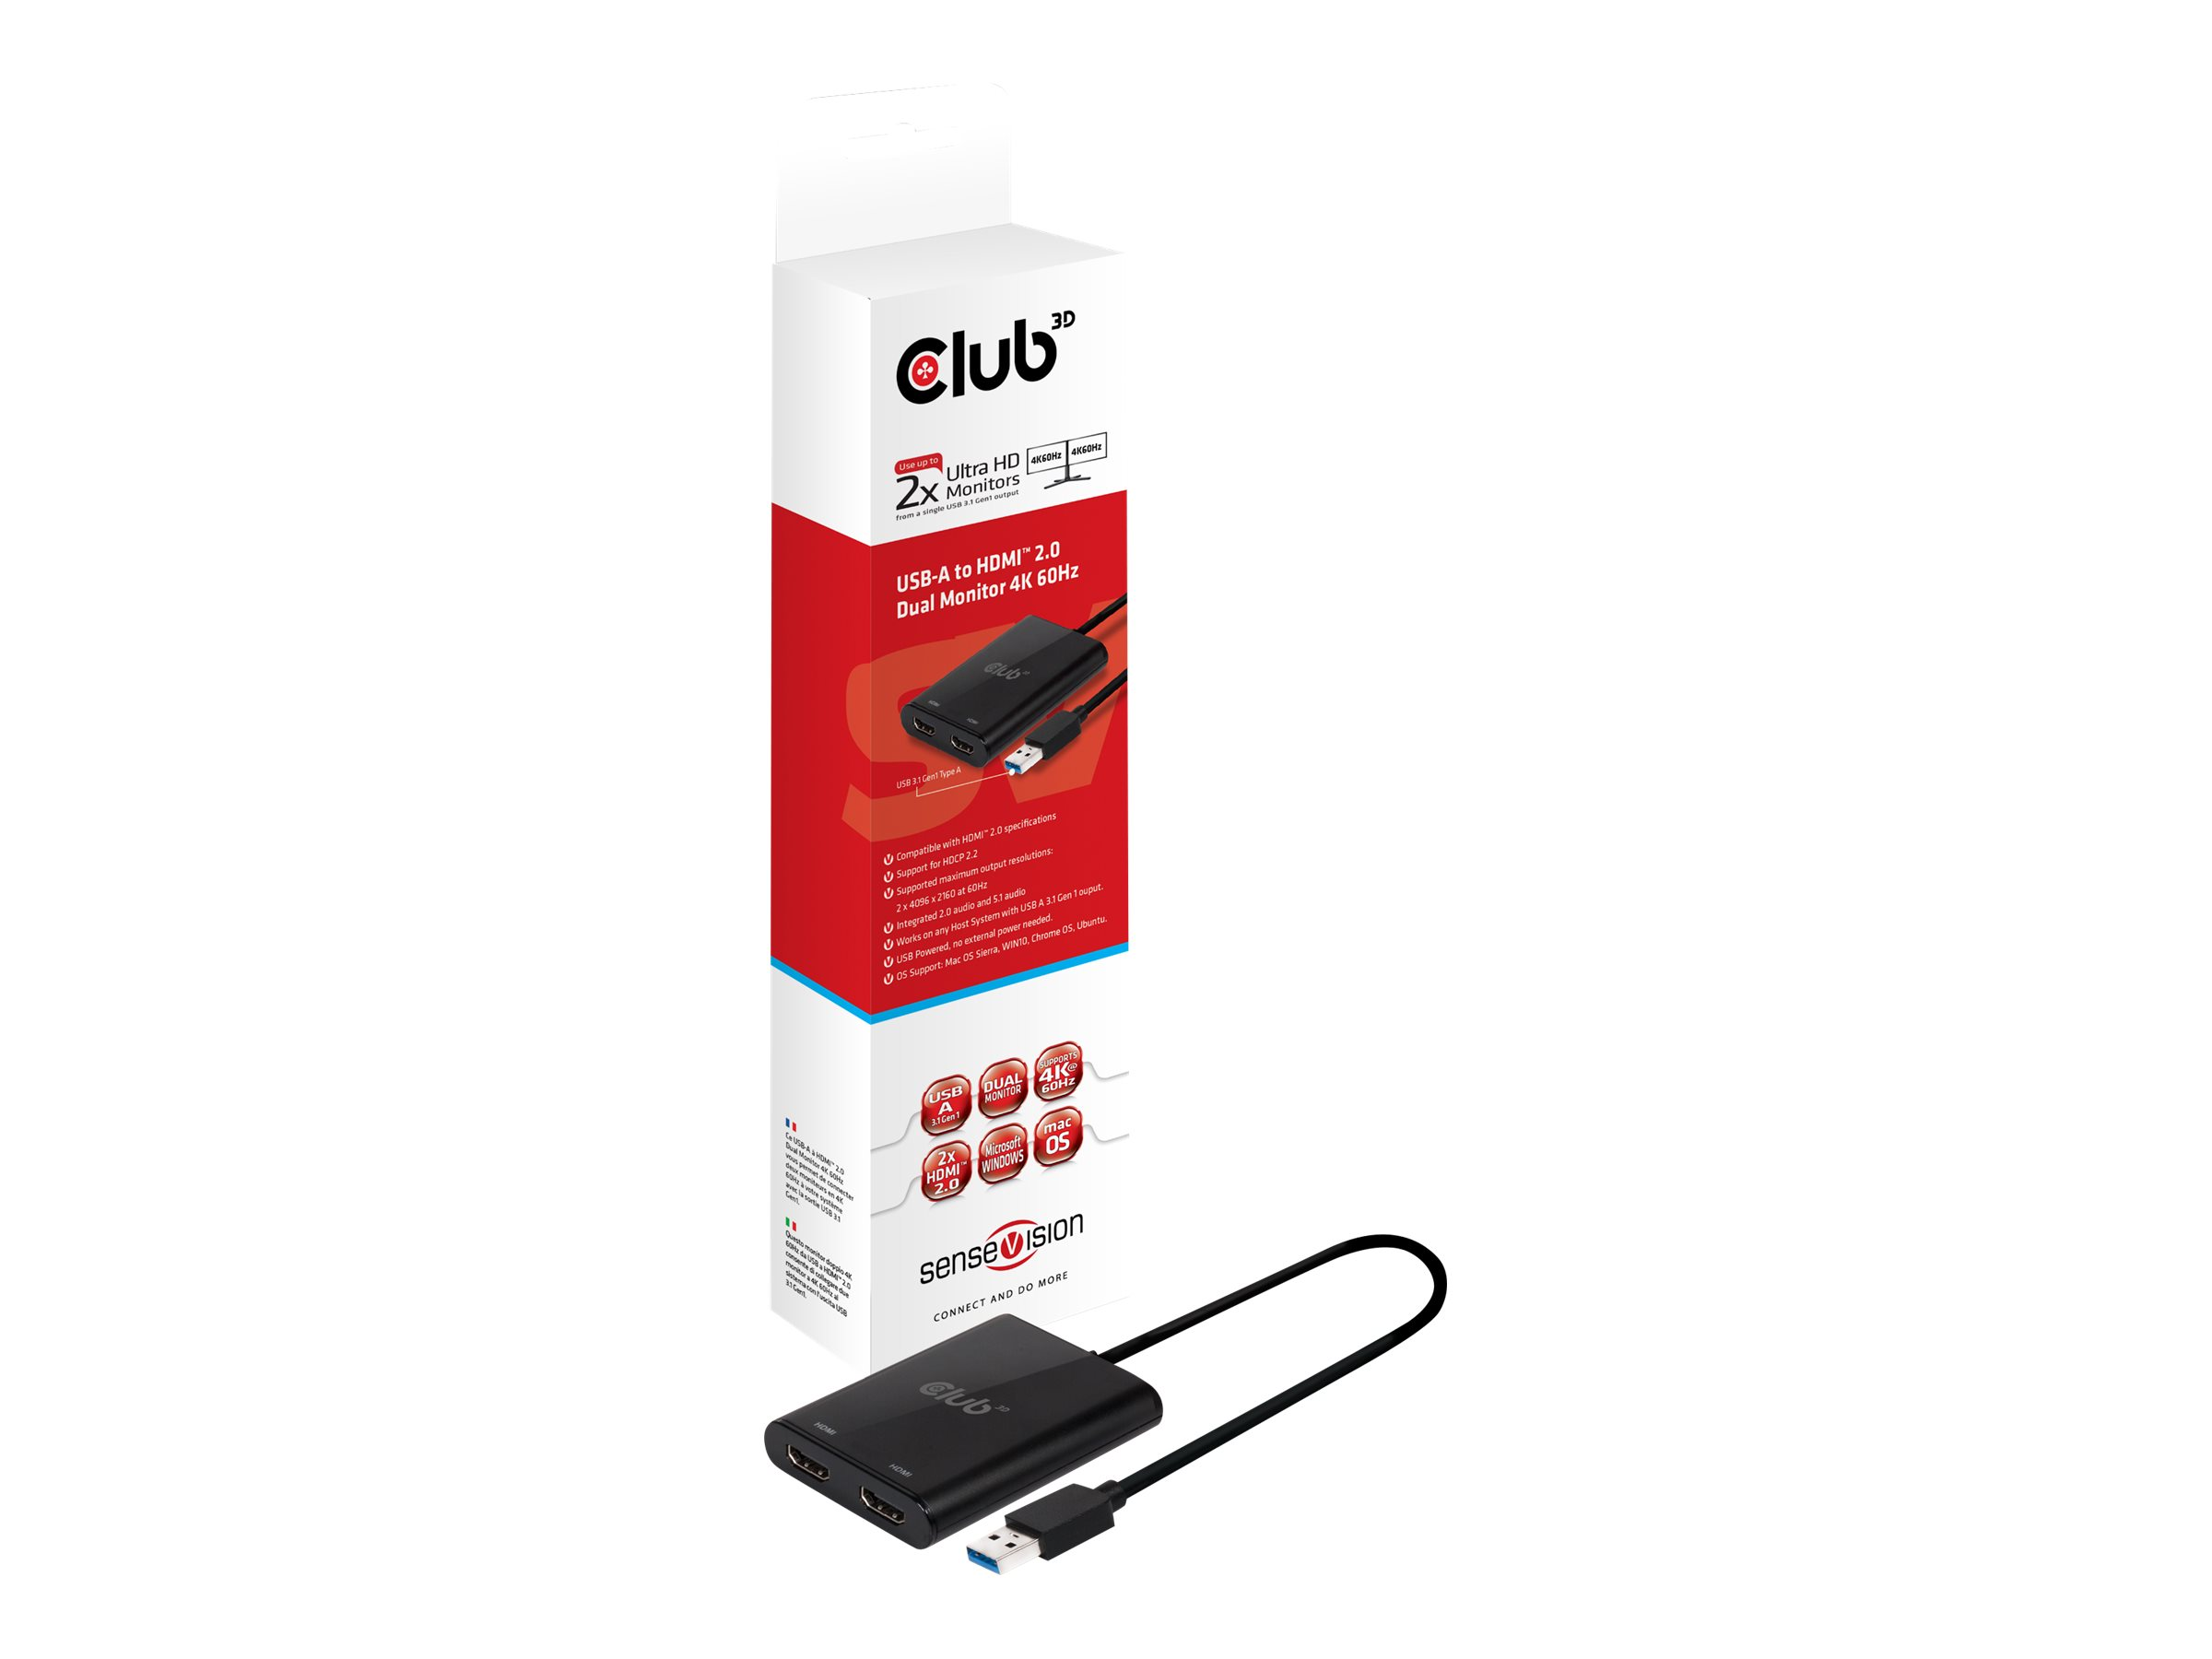 Club 3D SenseVision - Externer Videoadapter - USB 3.1 Gen 1 - 2 x HDMI